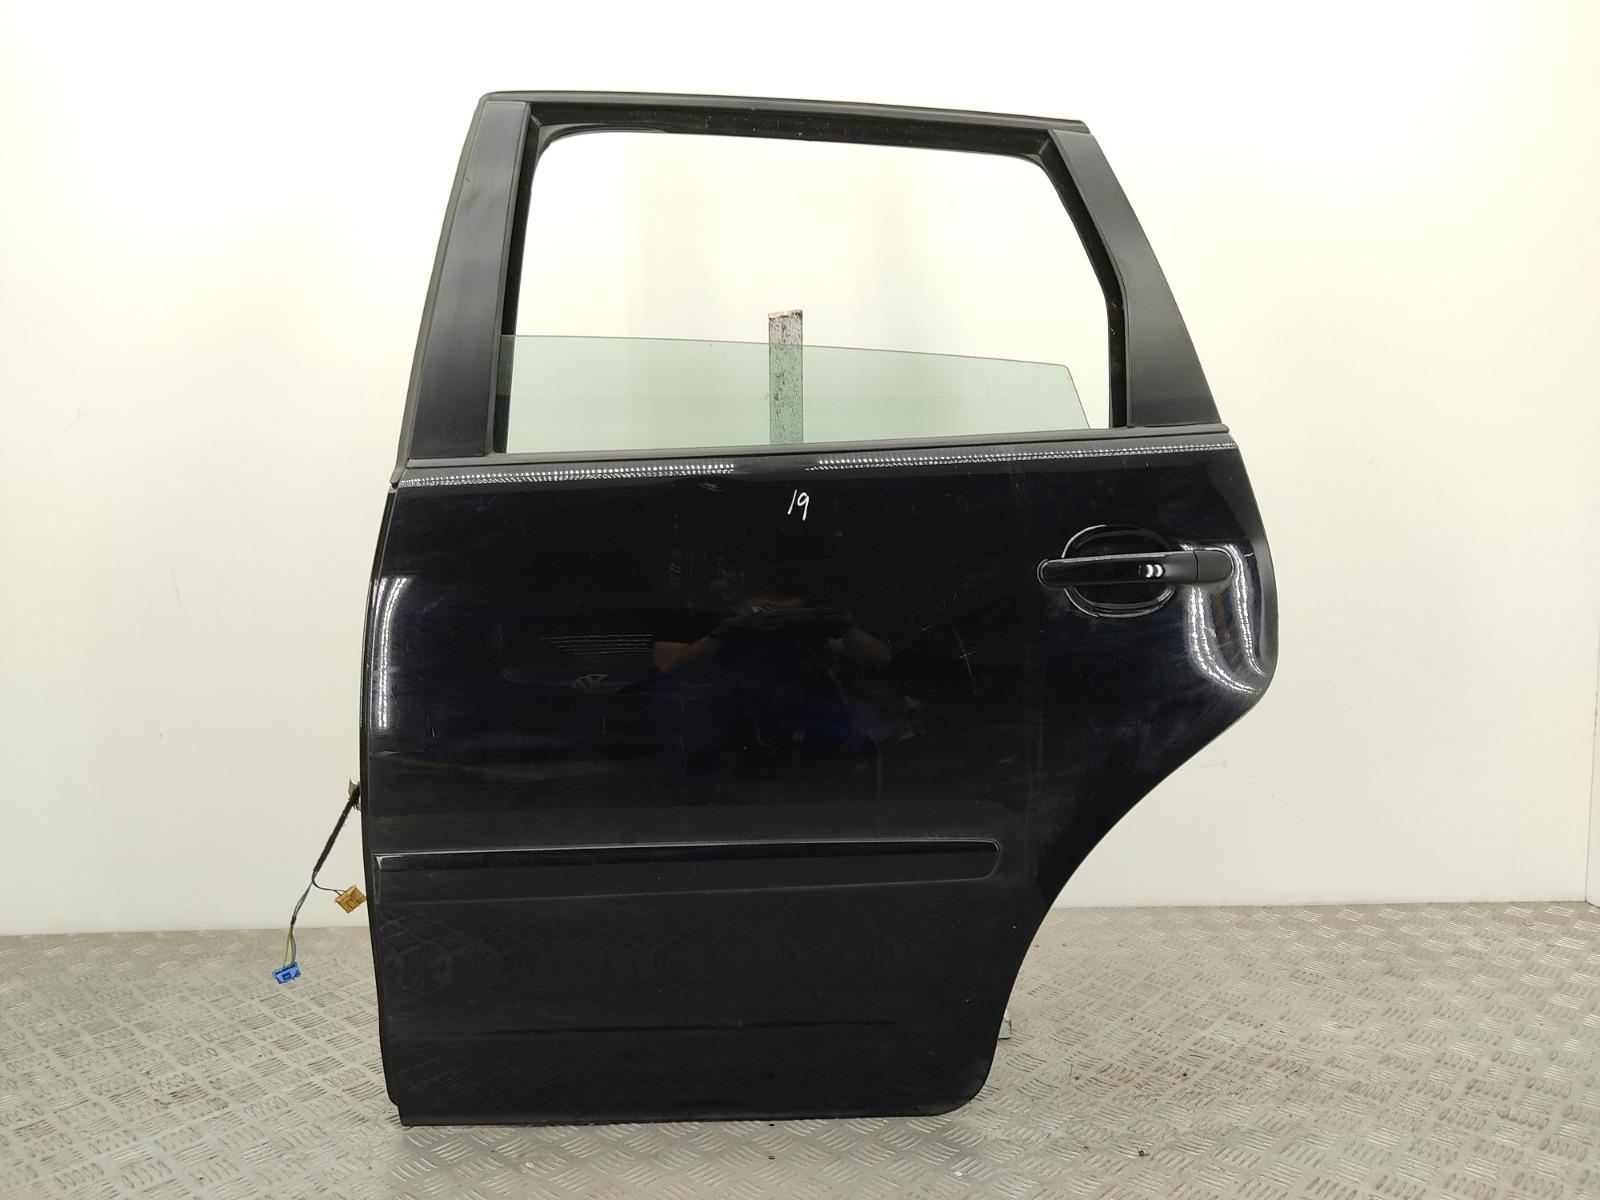 Дверь задняя левая Volkswagen Polo 1.4 TDI 2006 (б/у)